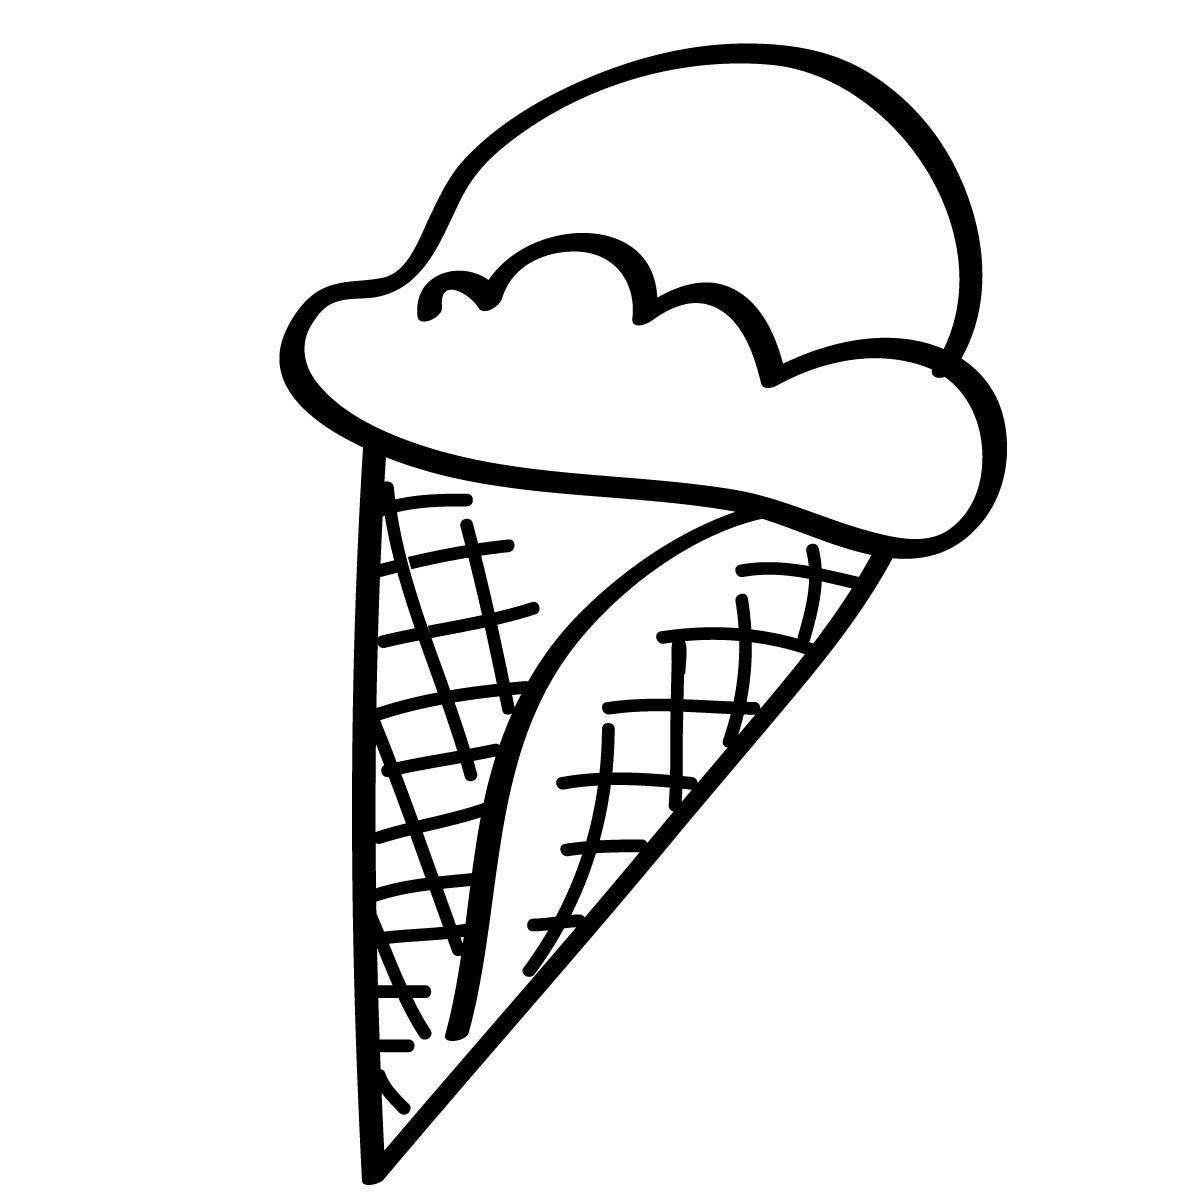 Ice Cream Scoop Drawing